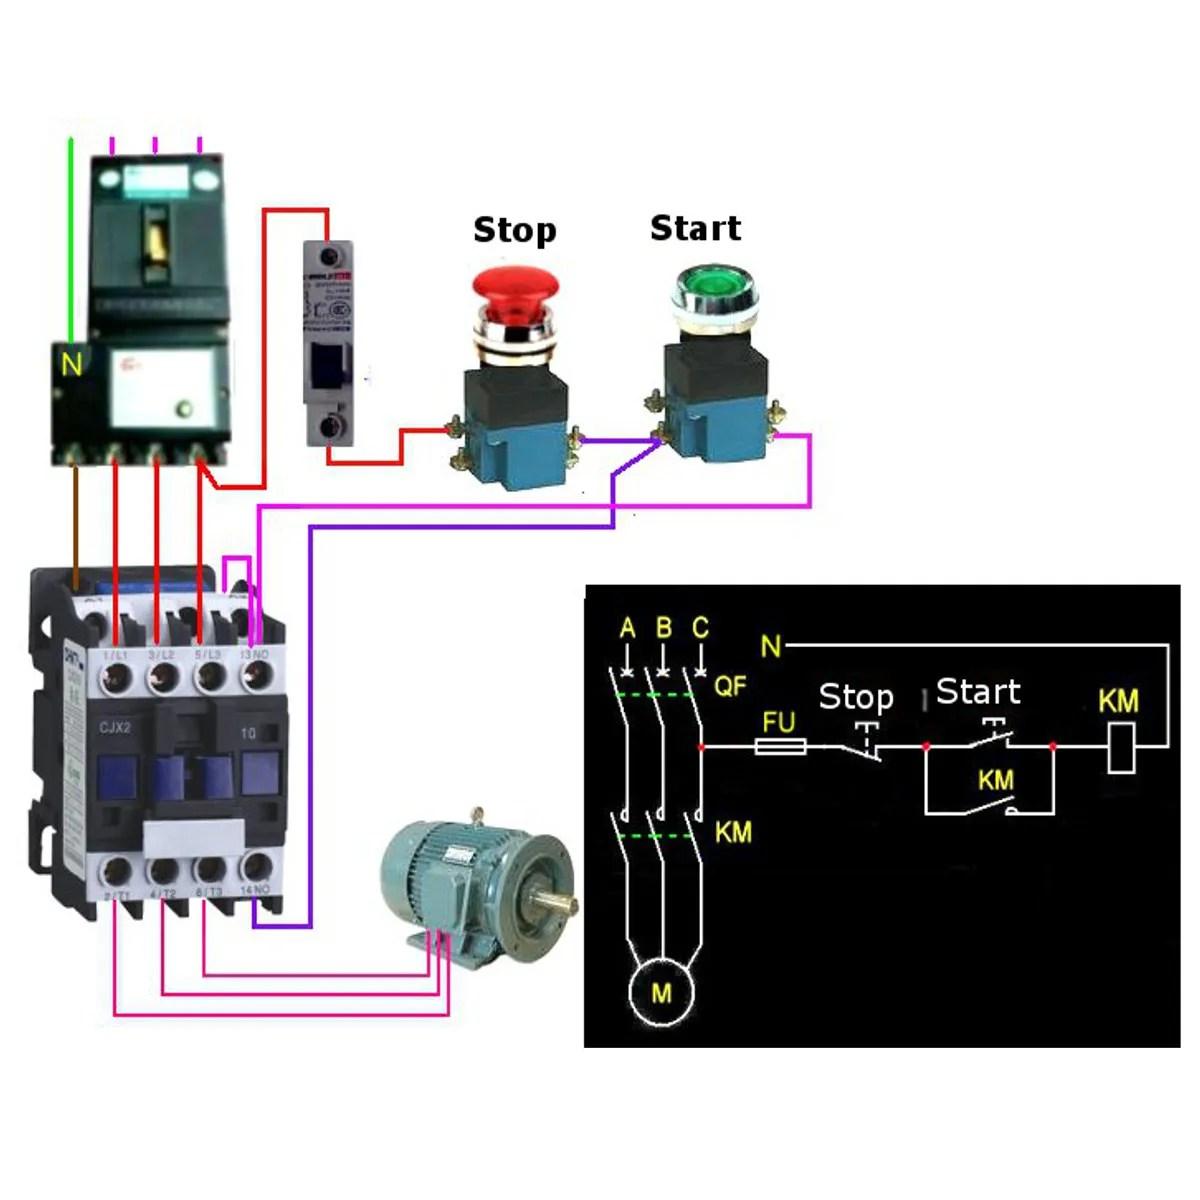 hight resolution of cjx2 1801 ac 220v 380v 18a contactor motor starter relay 3 pole 1nc